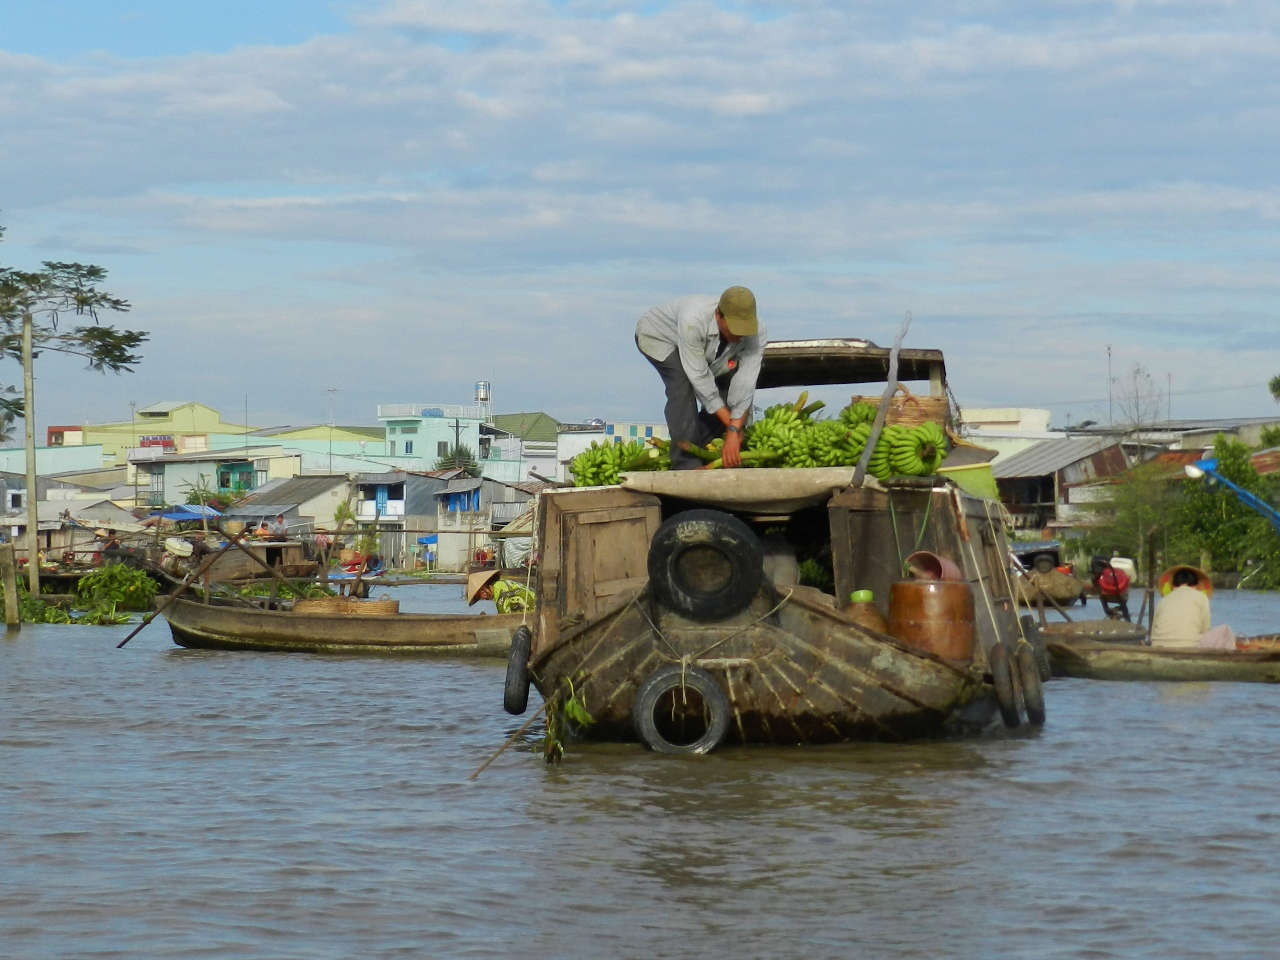 Cai Rang Market consists of pretty big boats selling their produce